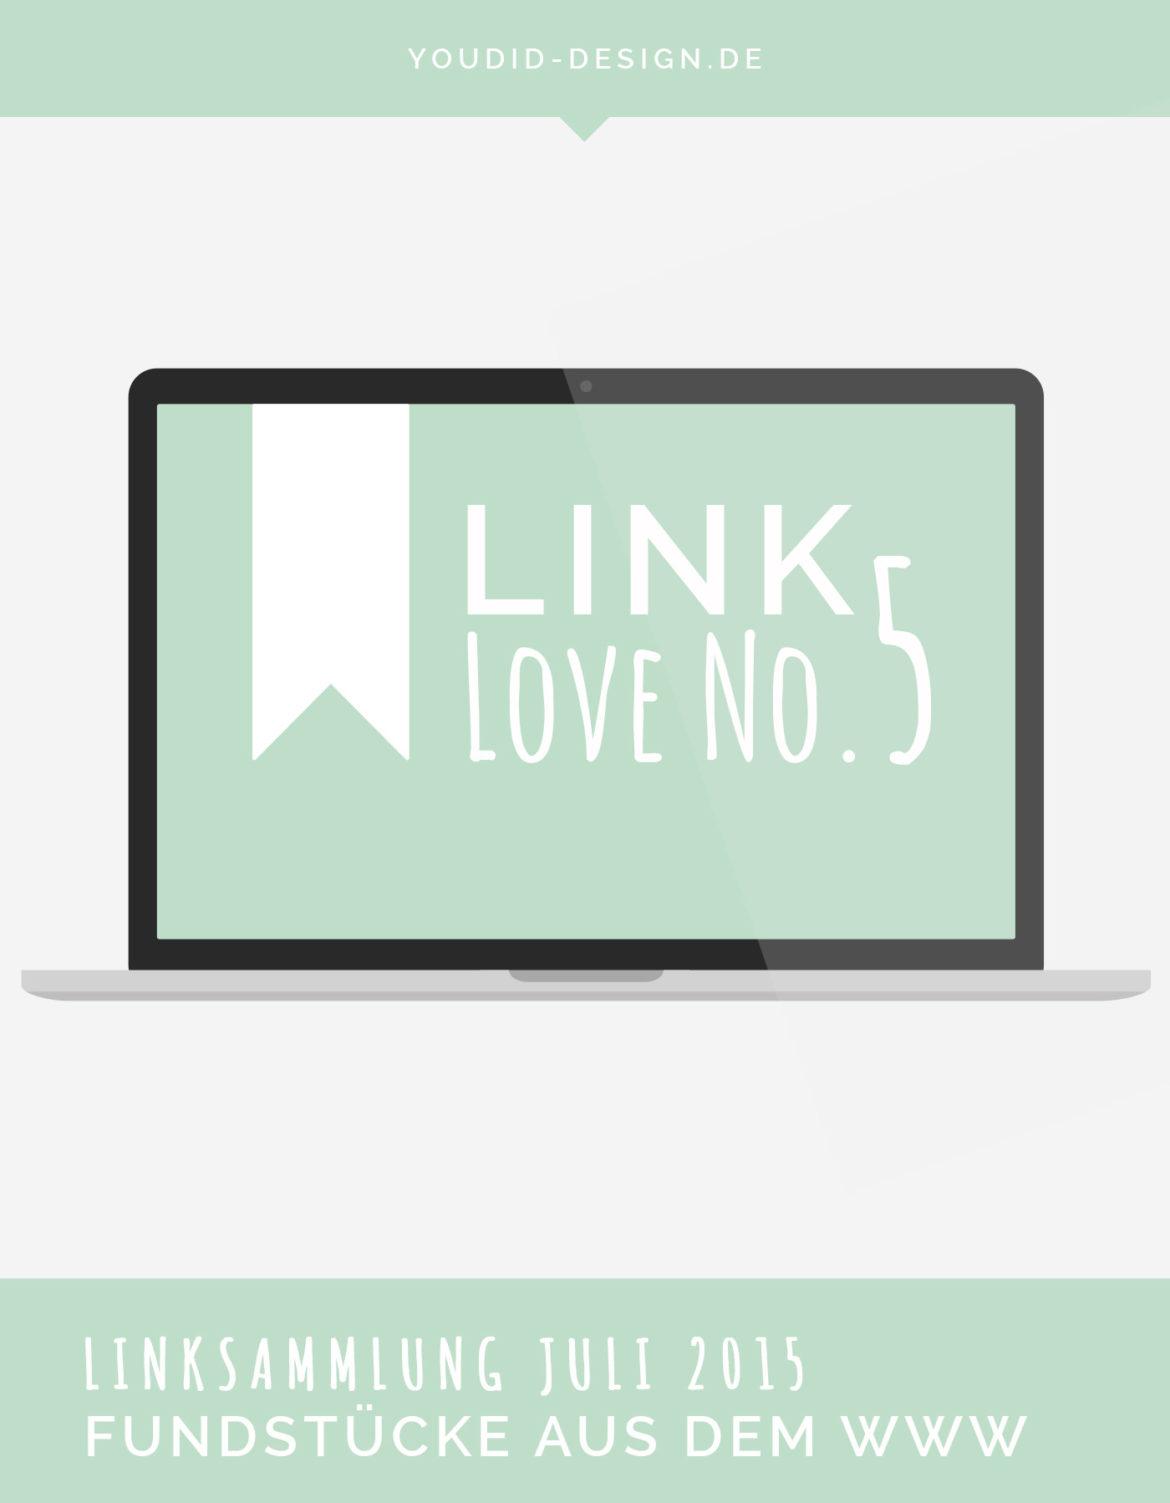 Linksammlung Linklove No 5 Juli 2015 | www.youdid-design.de